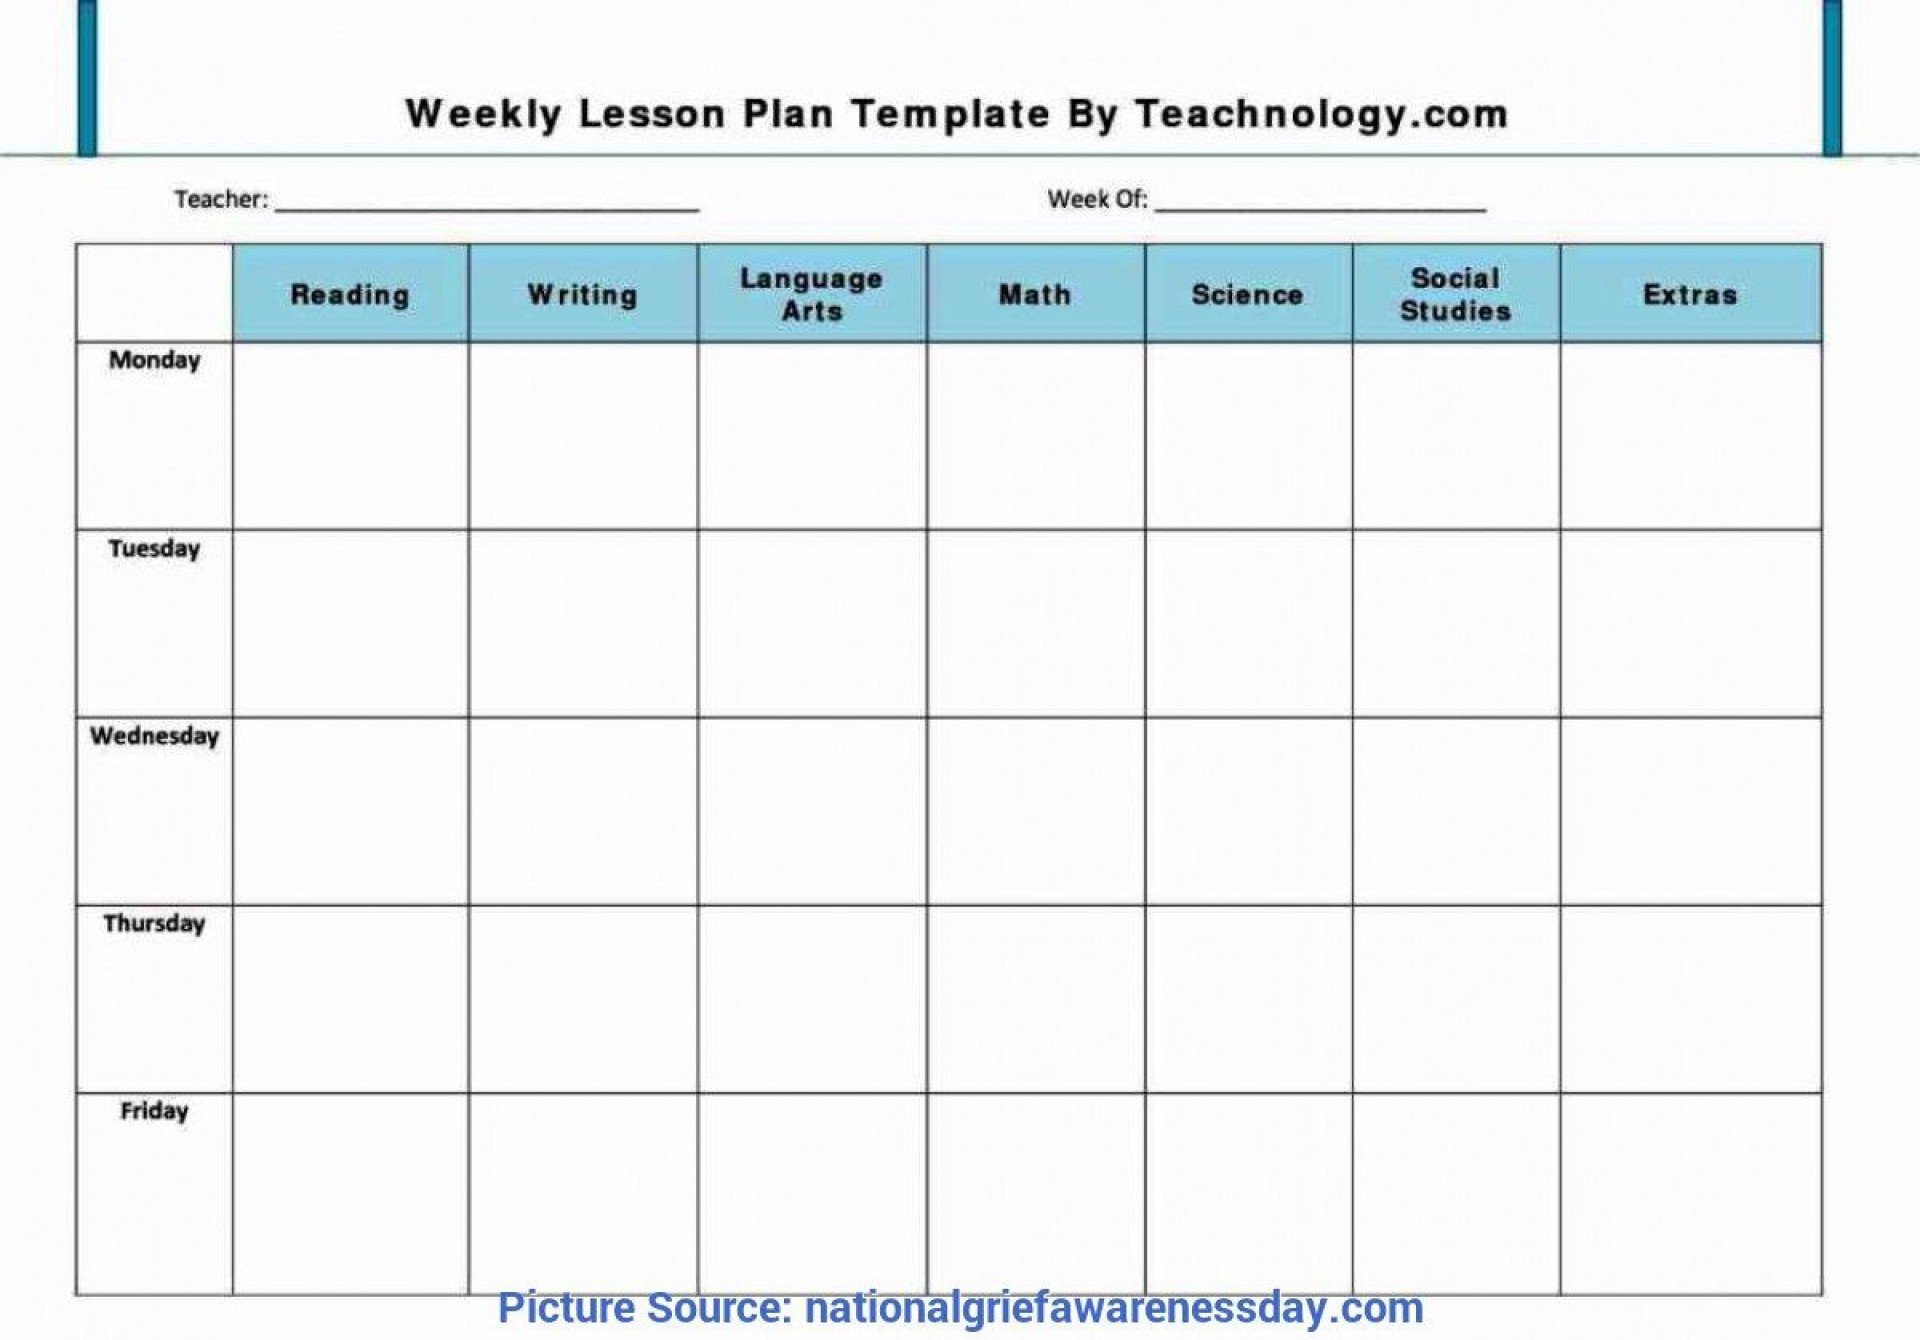 001 Formidable Lesson Plan Template Free Example  Weekly Printable Editable Preschool Format1920